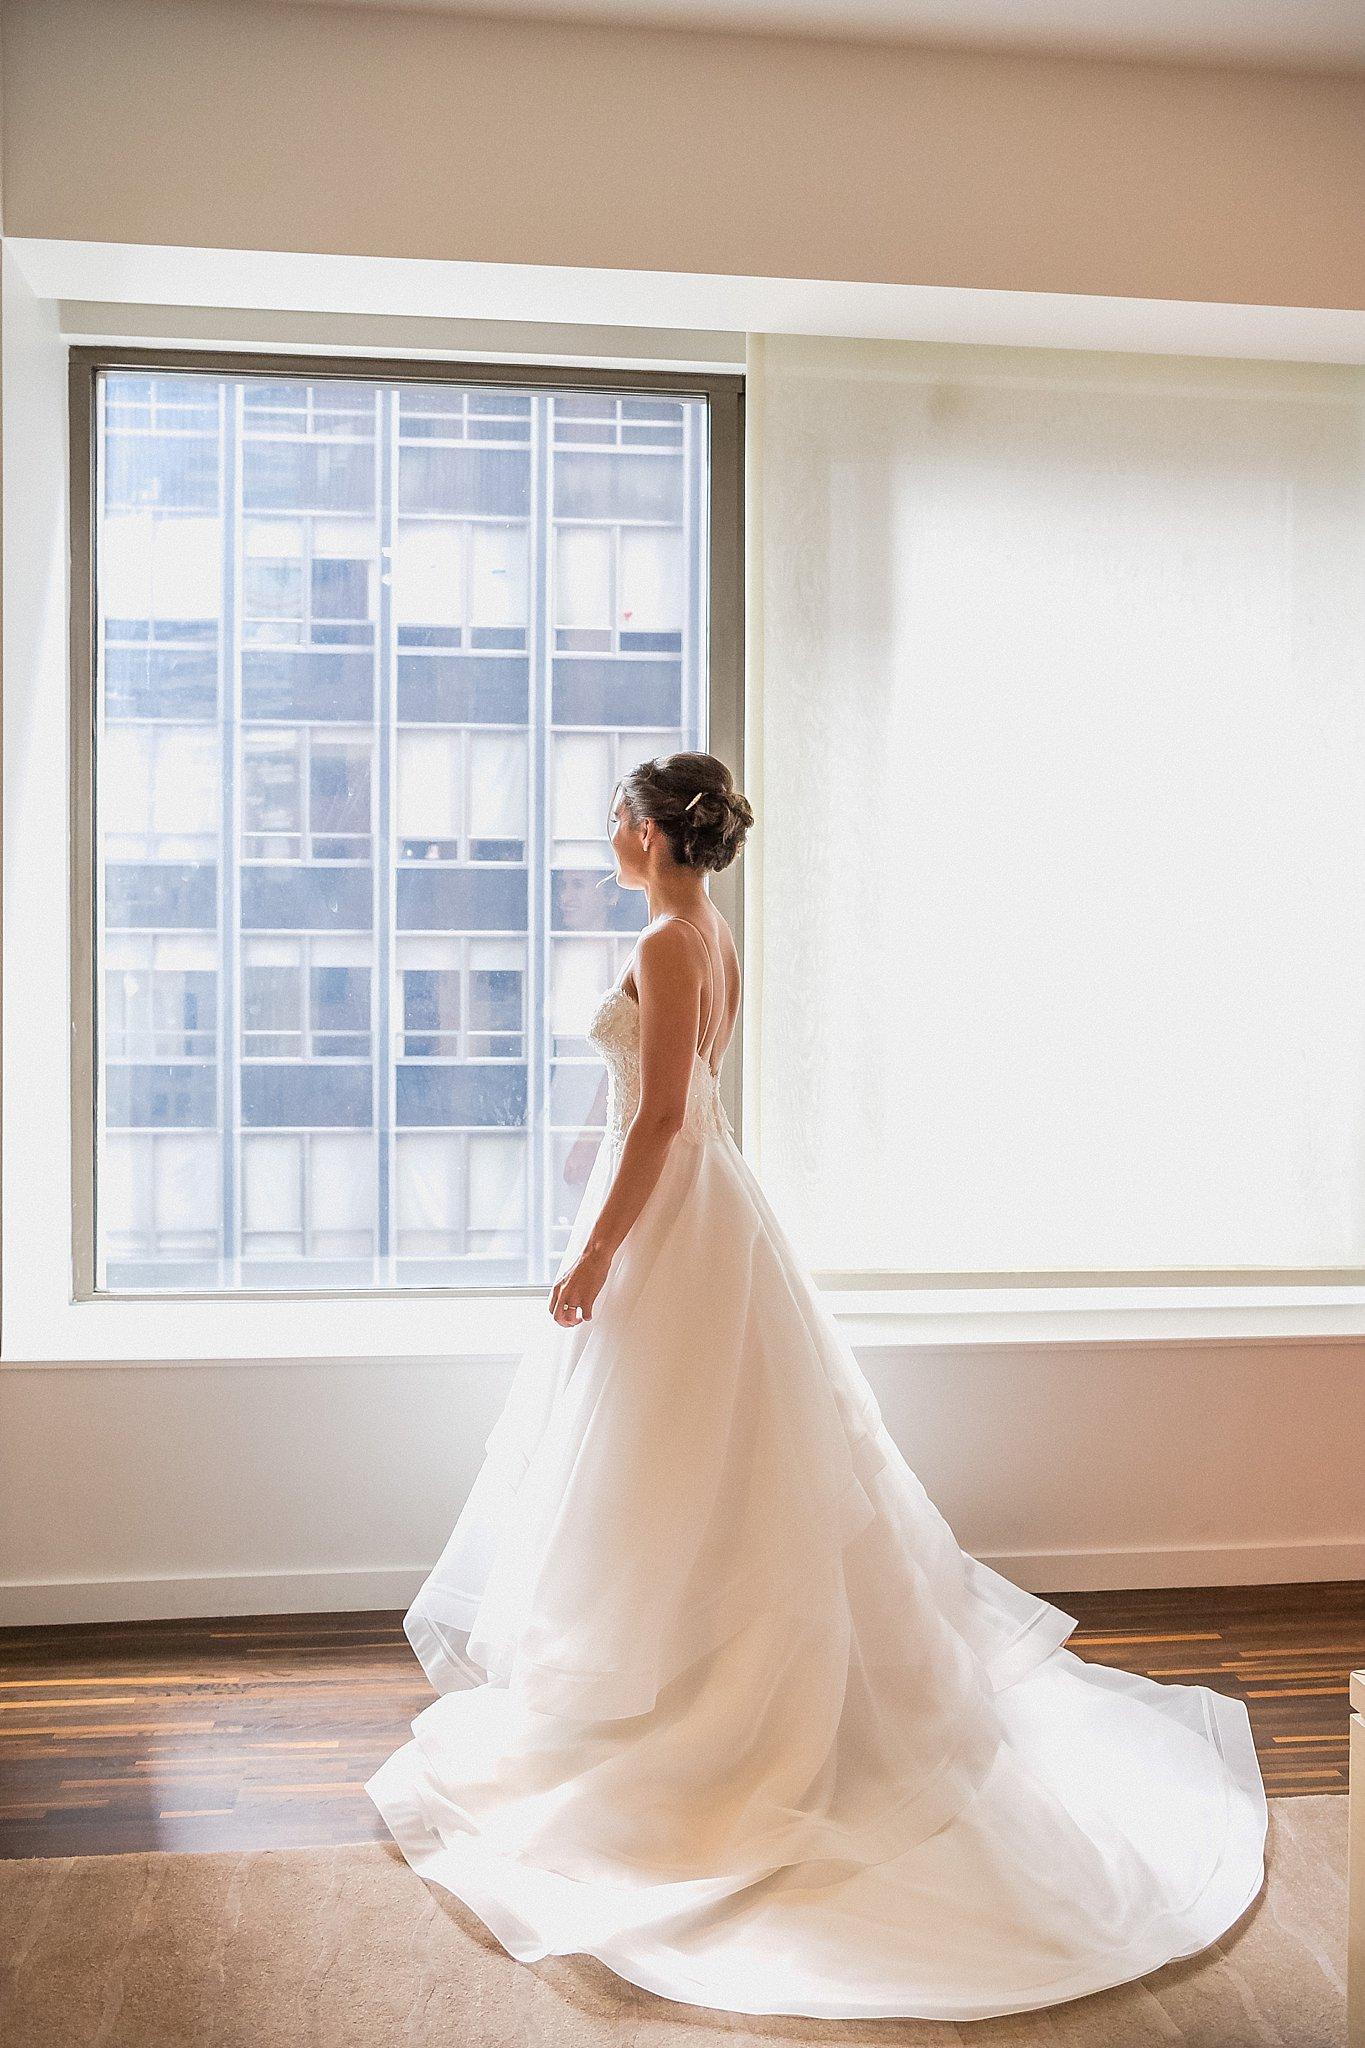 Bride Wedding Day Look on her Wedding